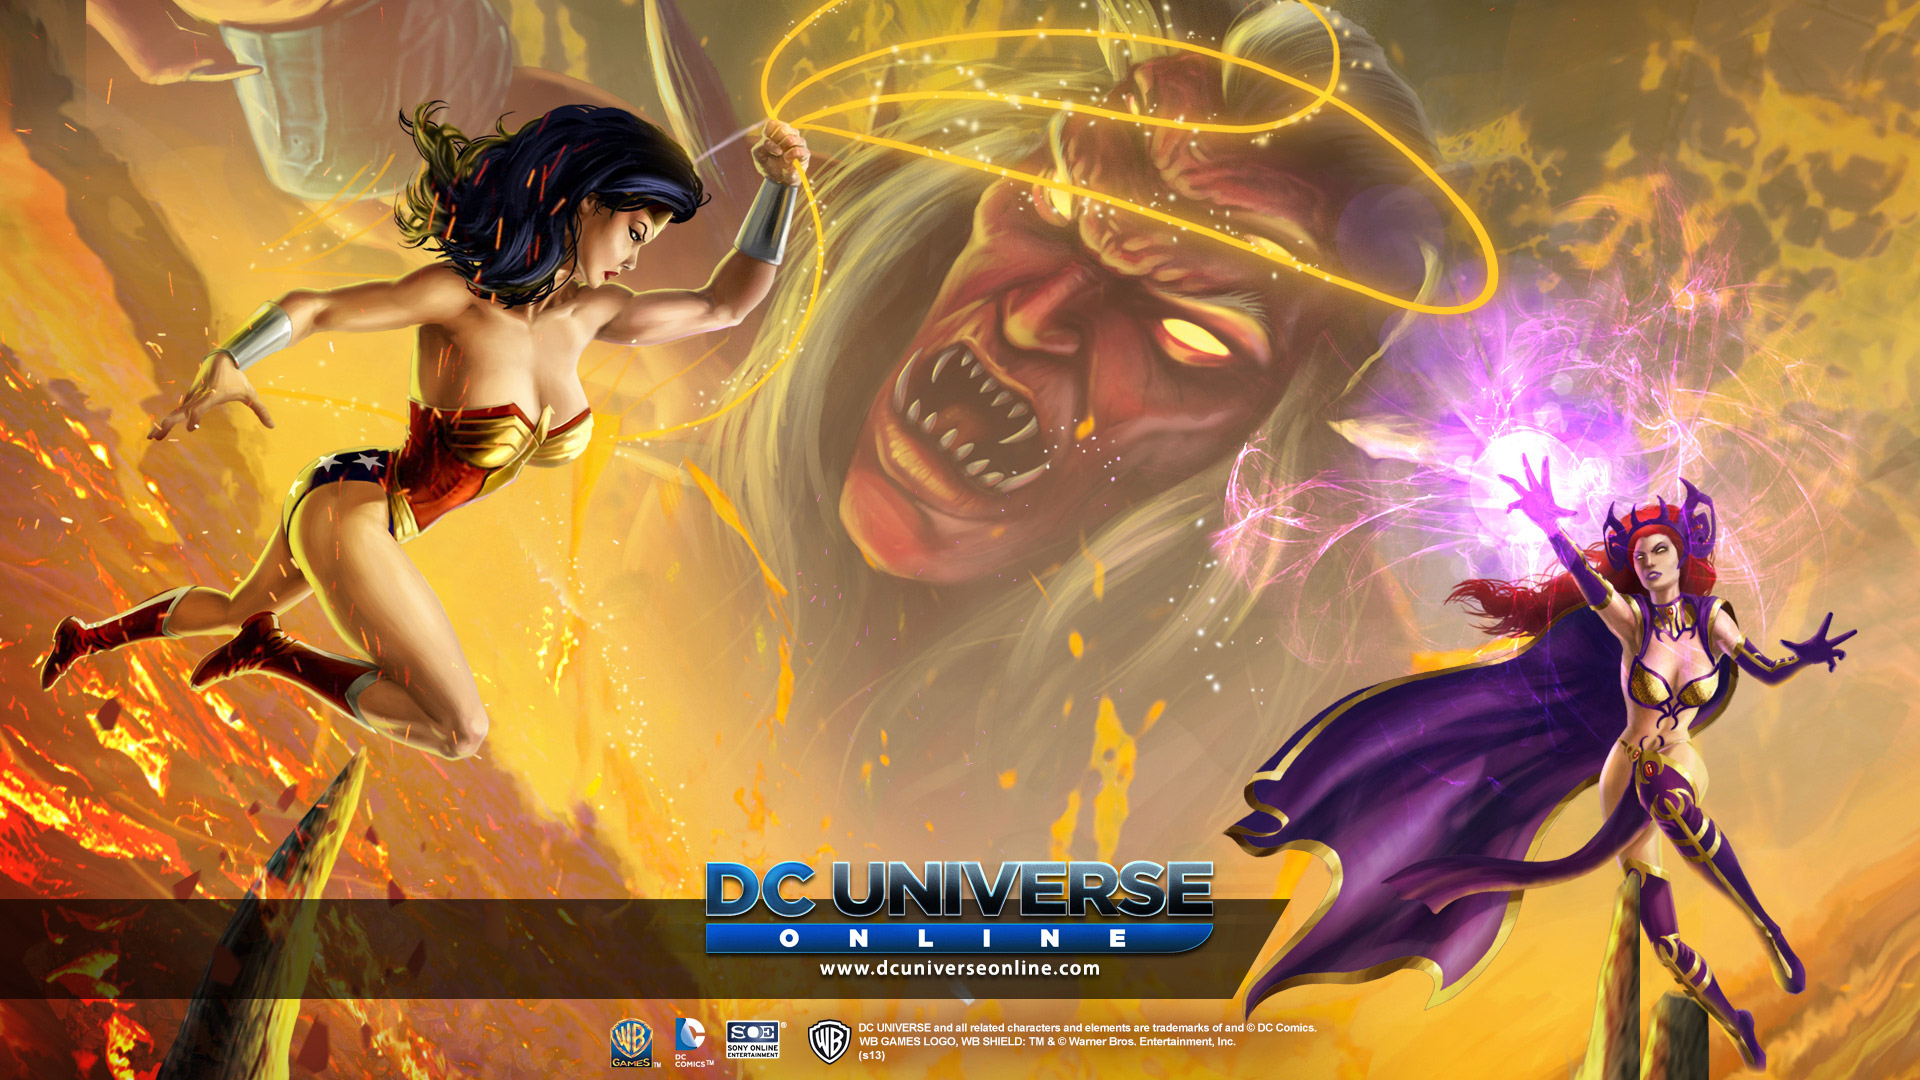 DC Universe Online Wallpaper in 1920x1080